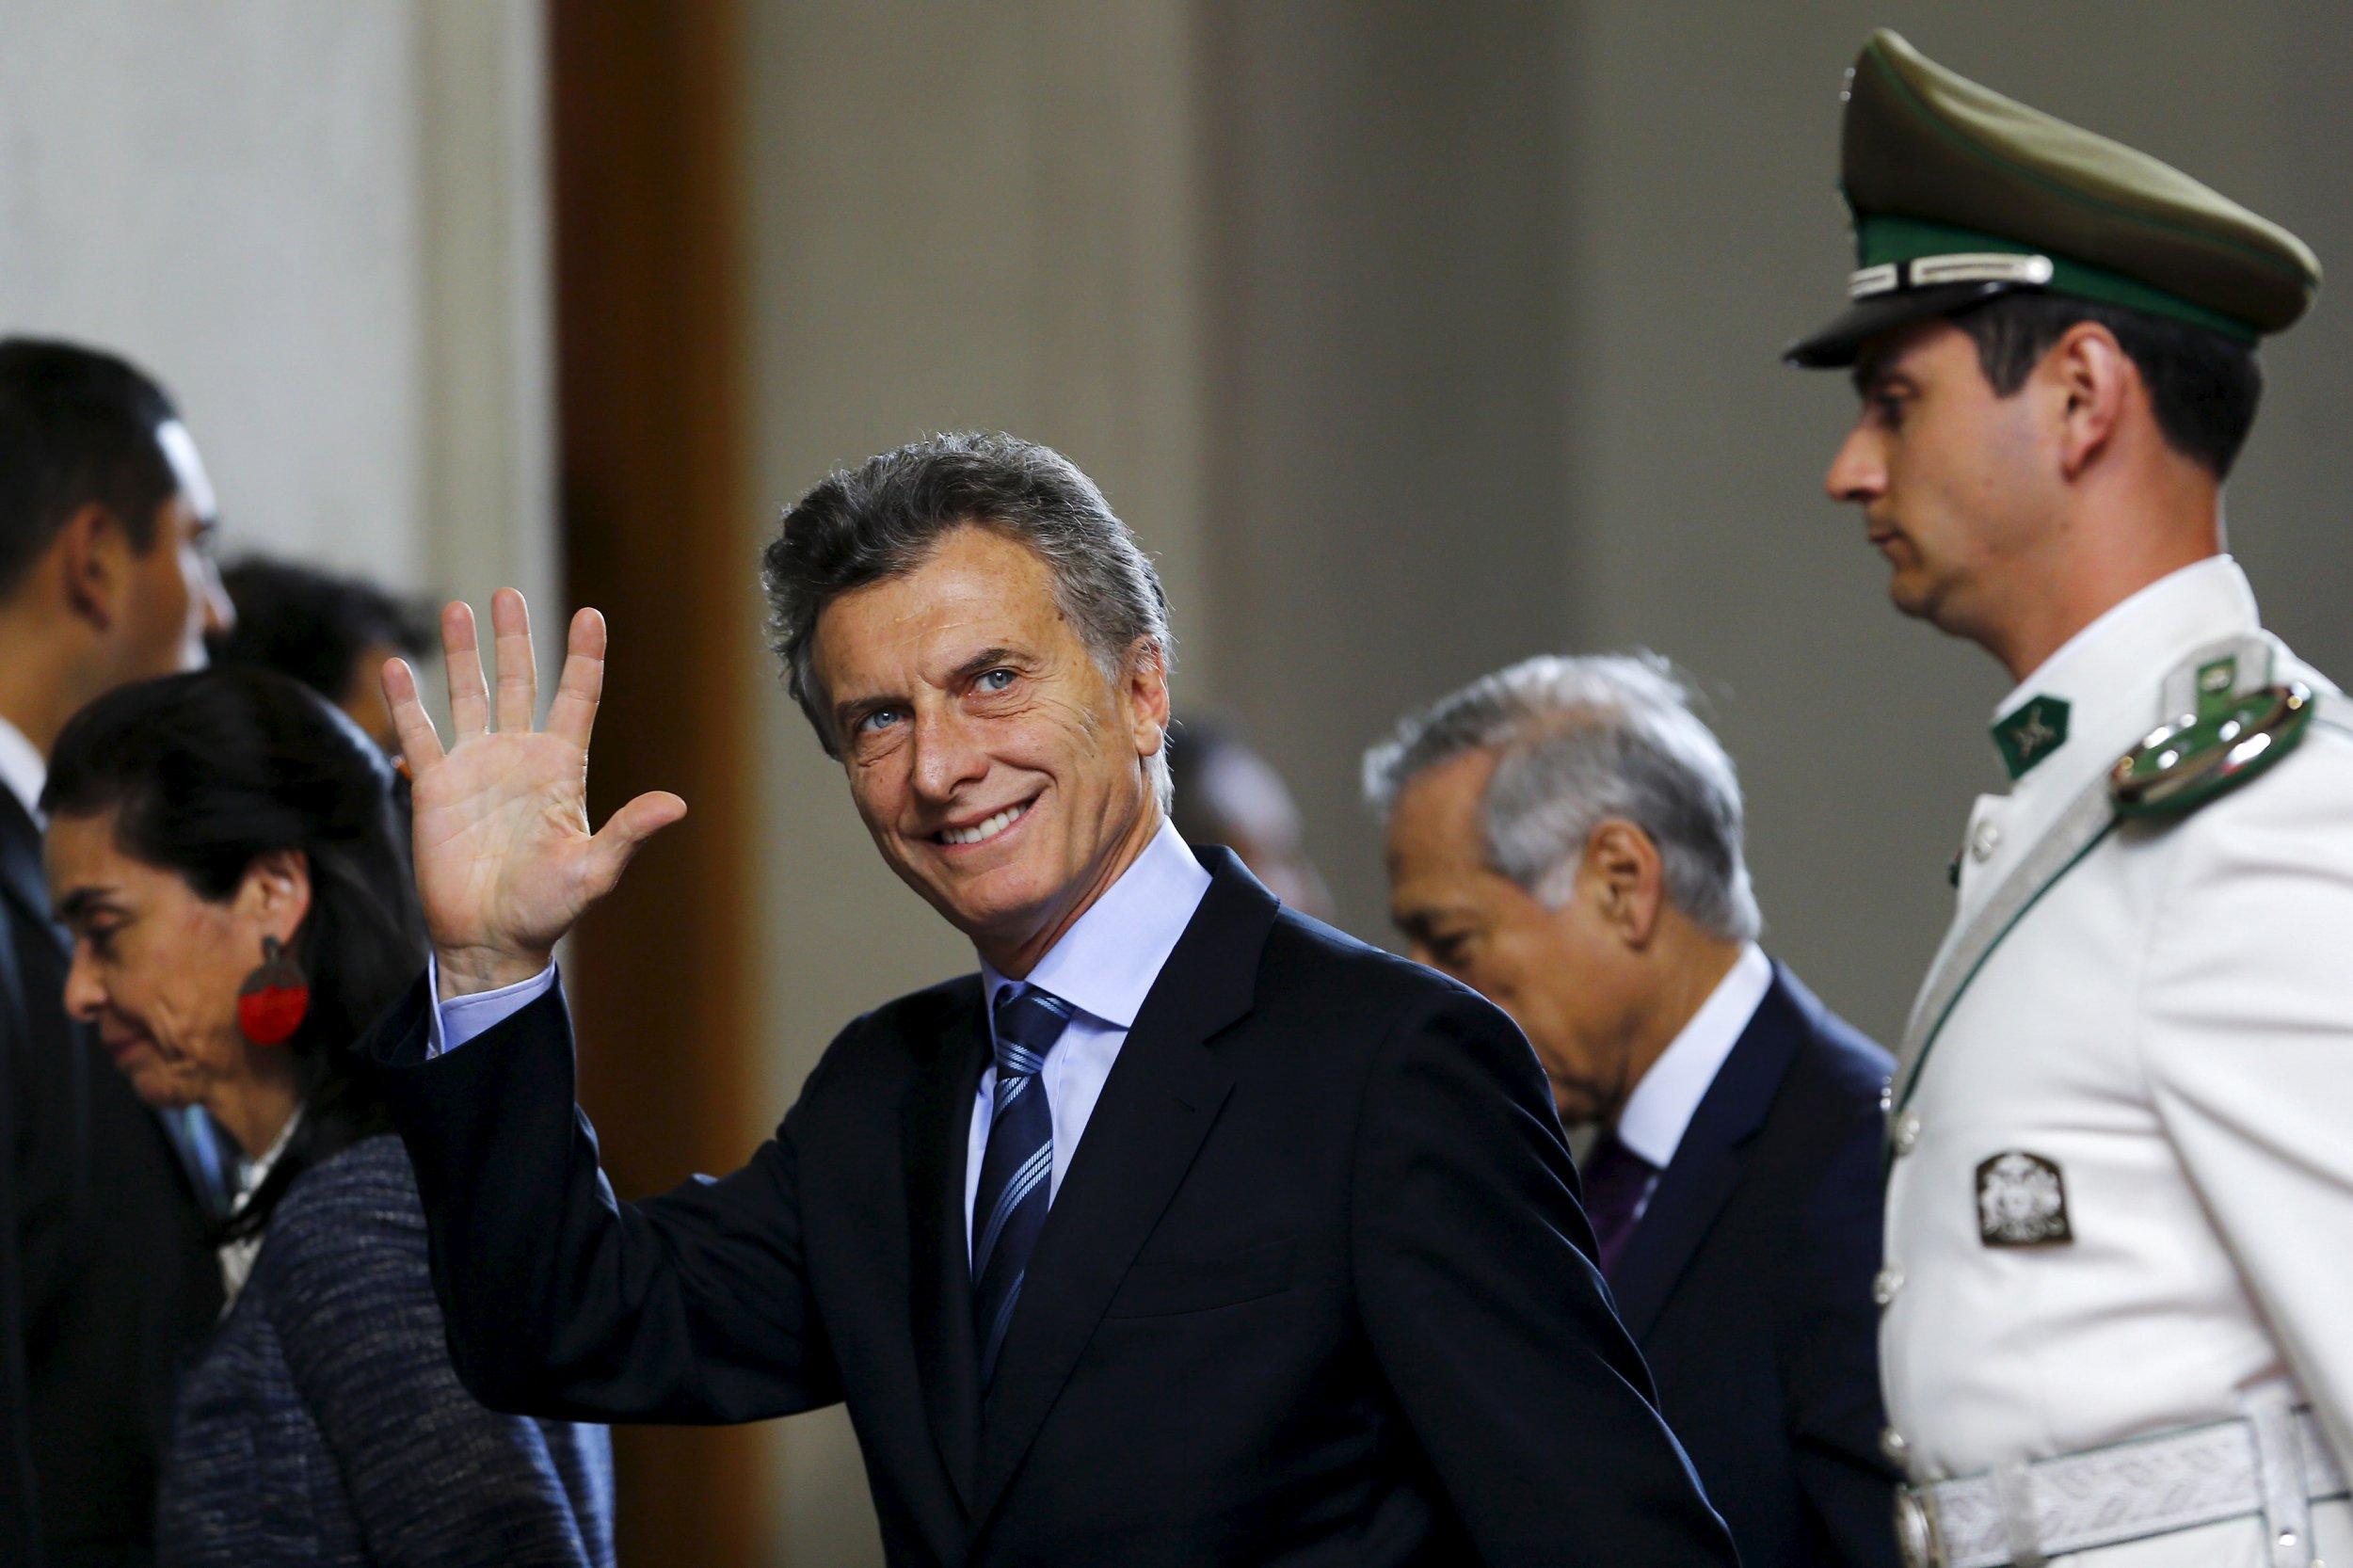 Macri Argentina Election South America